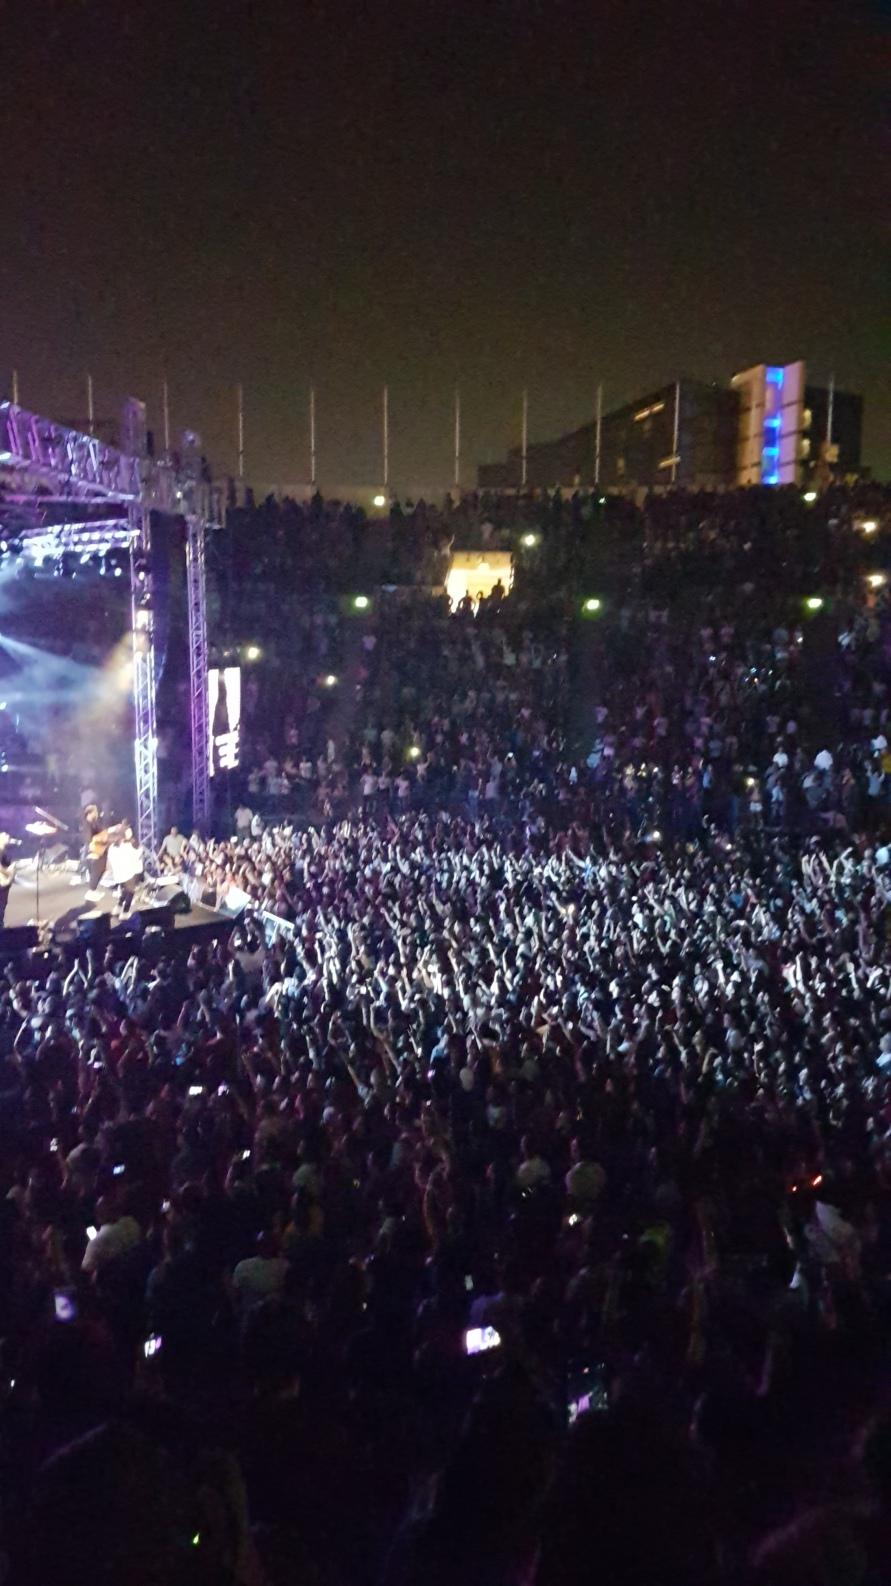 Vertical Crowd